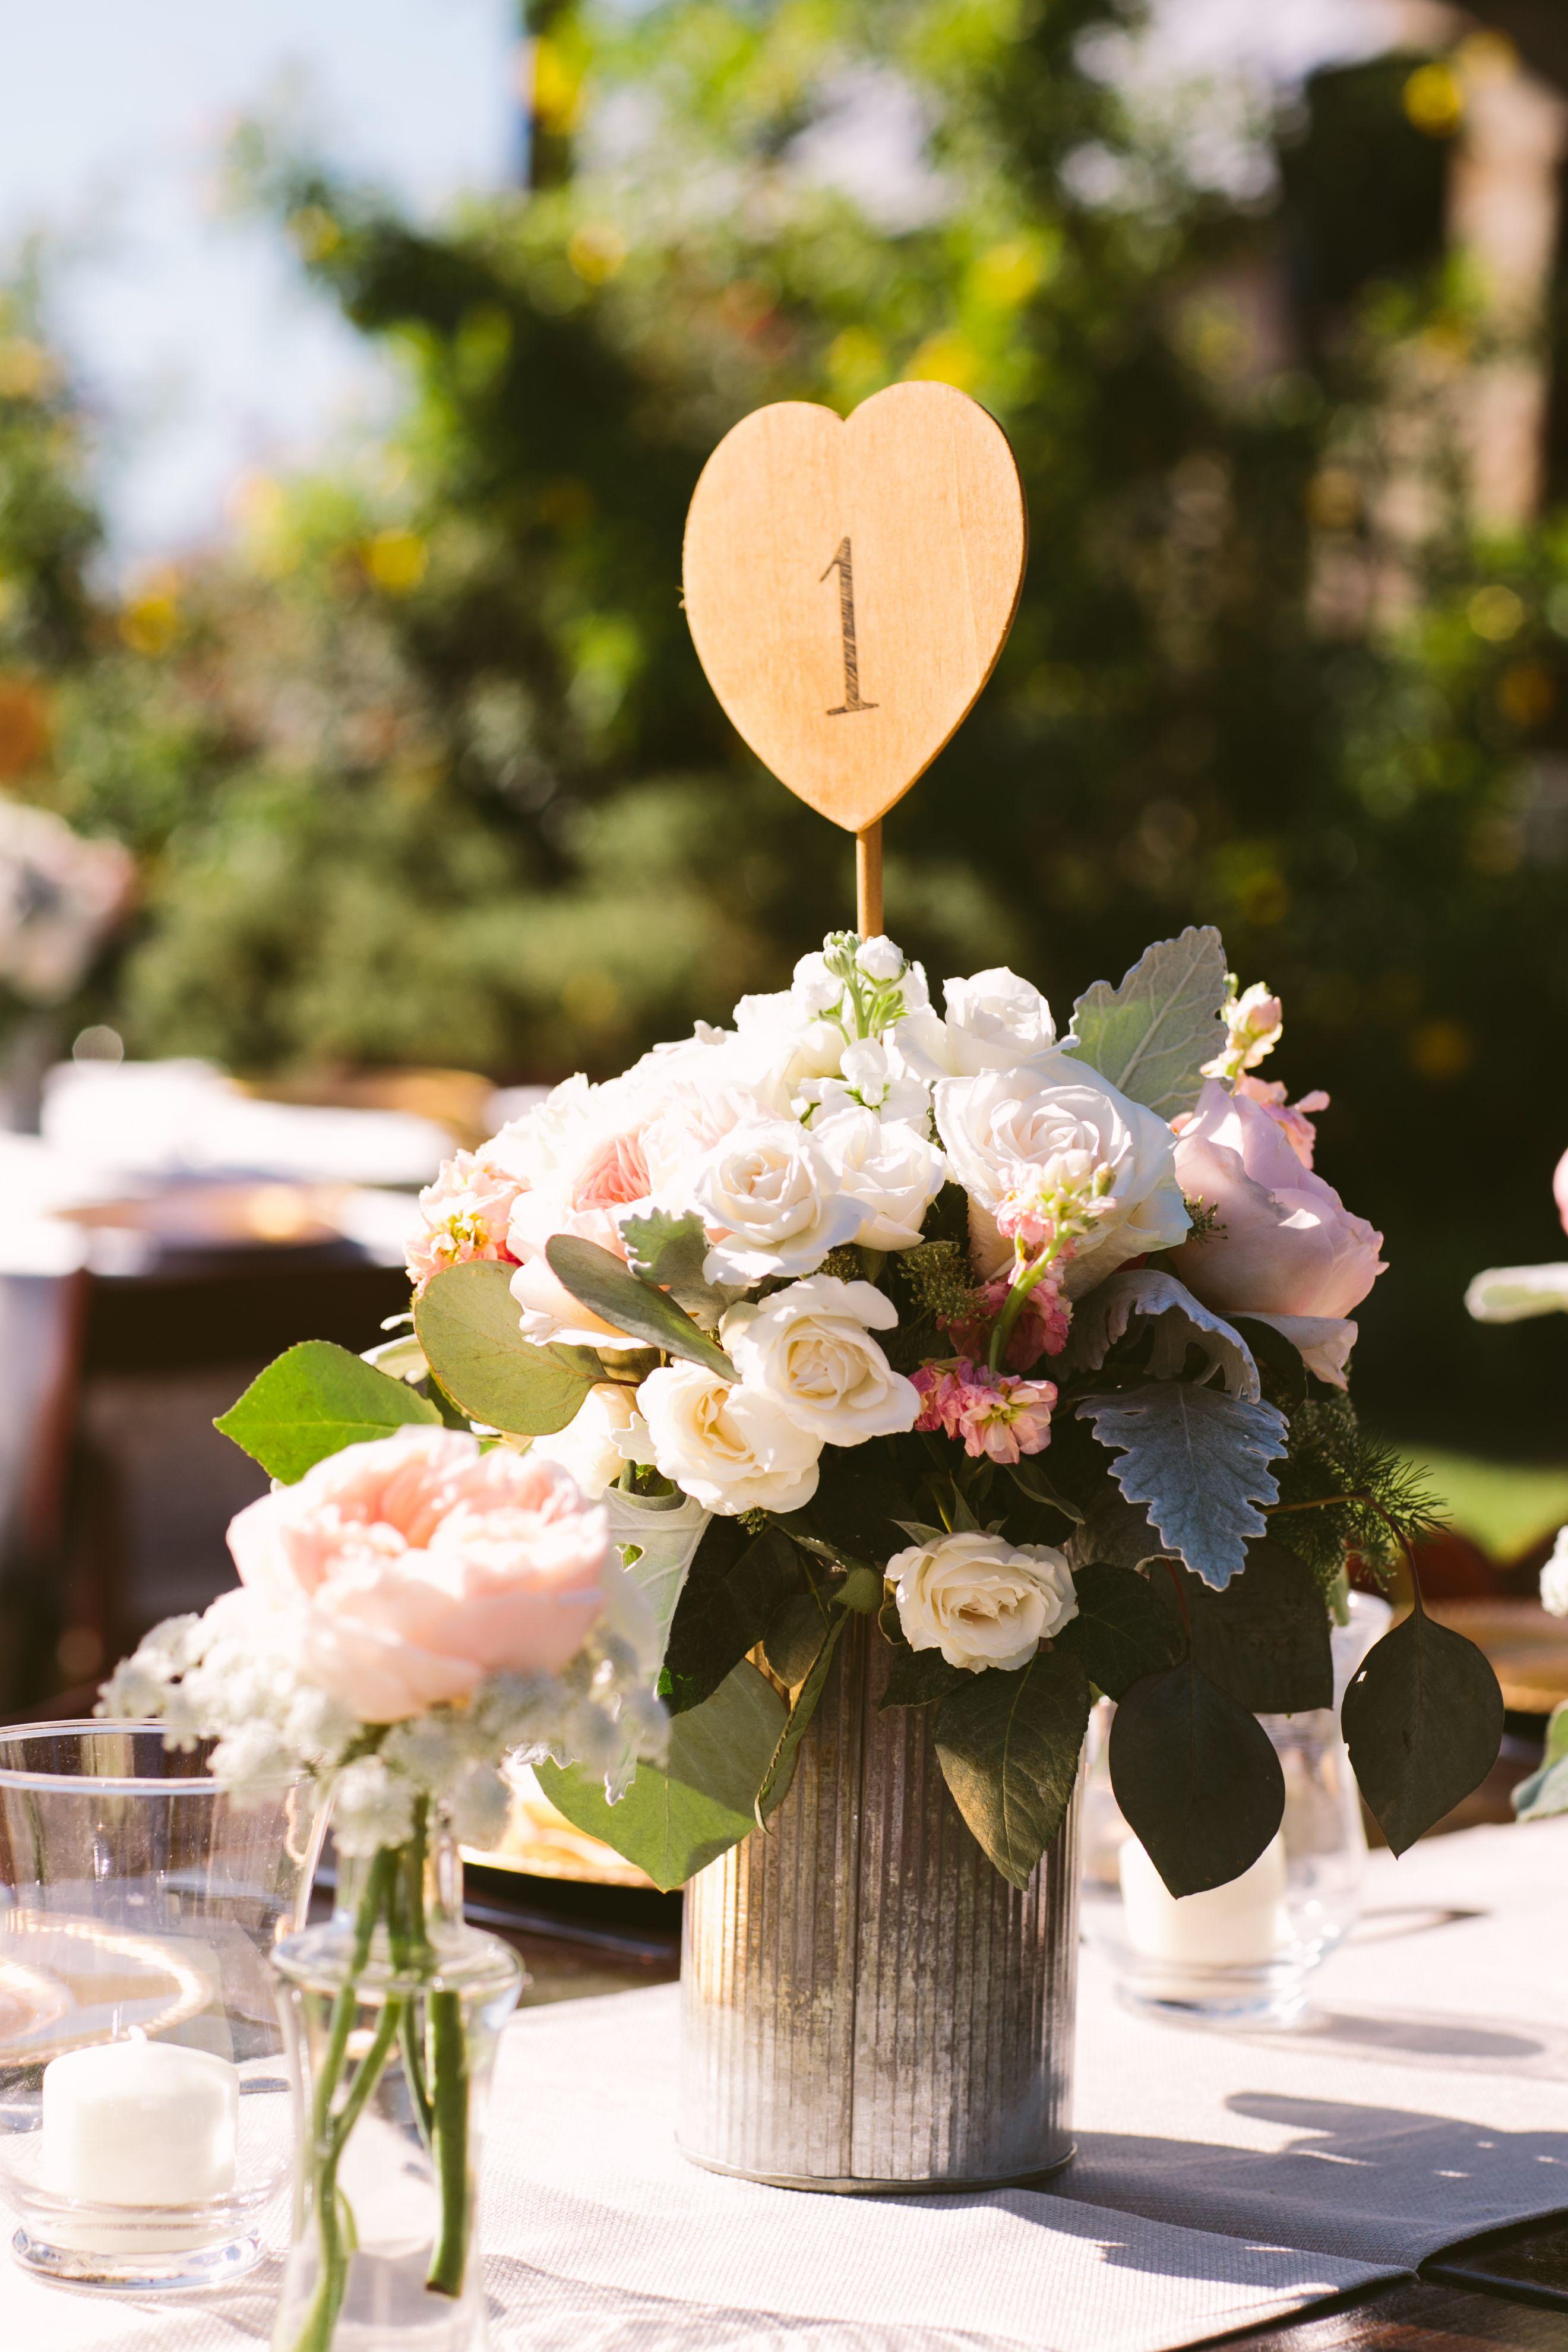 Mint and Blush Wedding at Pecan Springs Ranch, Austin. Floral design by Flora Fetish. Photography by Al Gawlik #florafetish #pecanspringswedding #weddingaislebox #algawlik